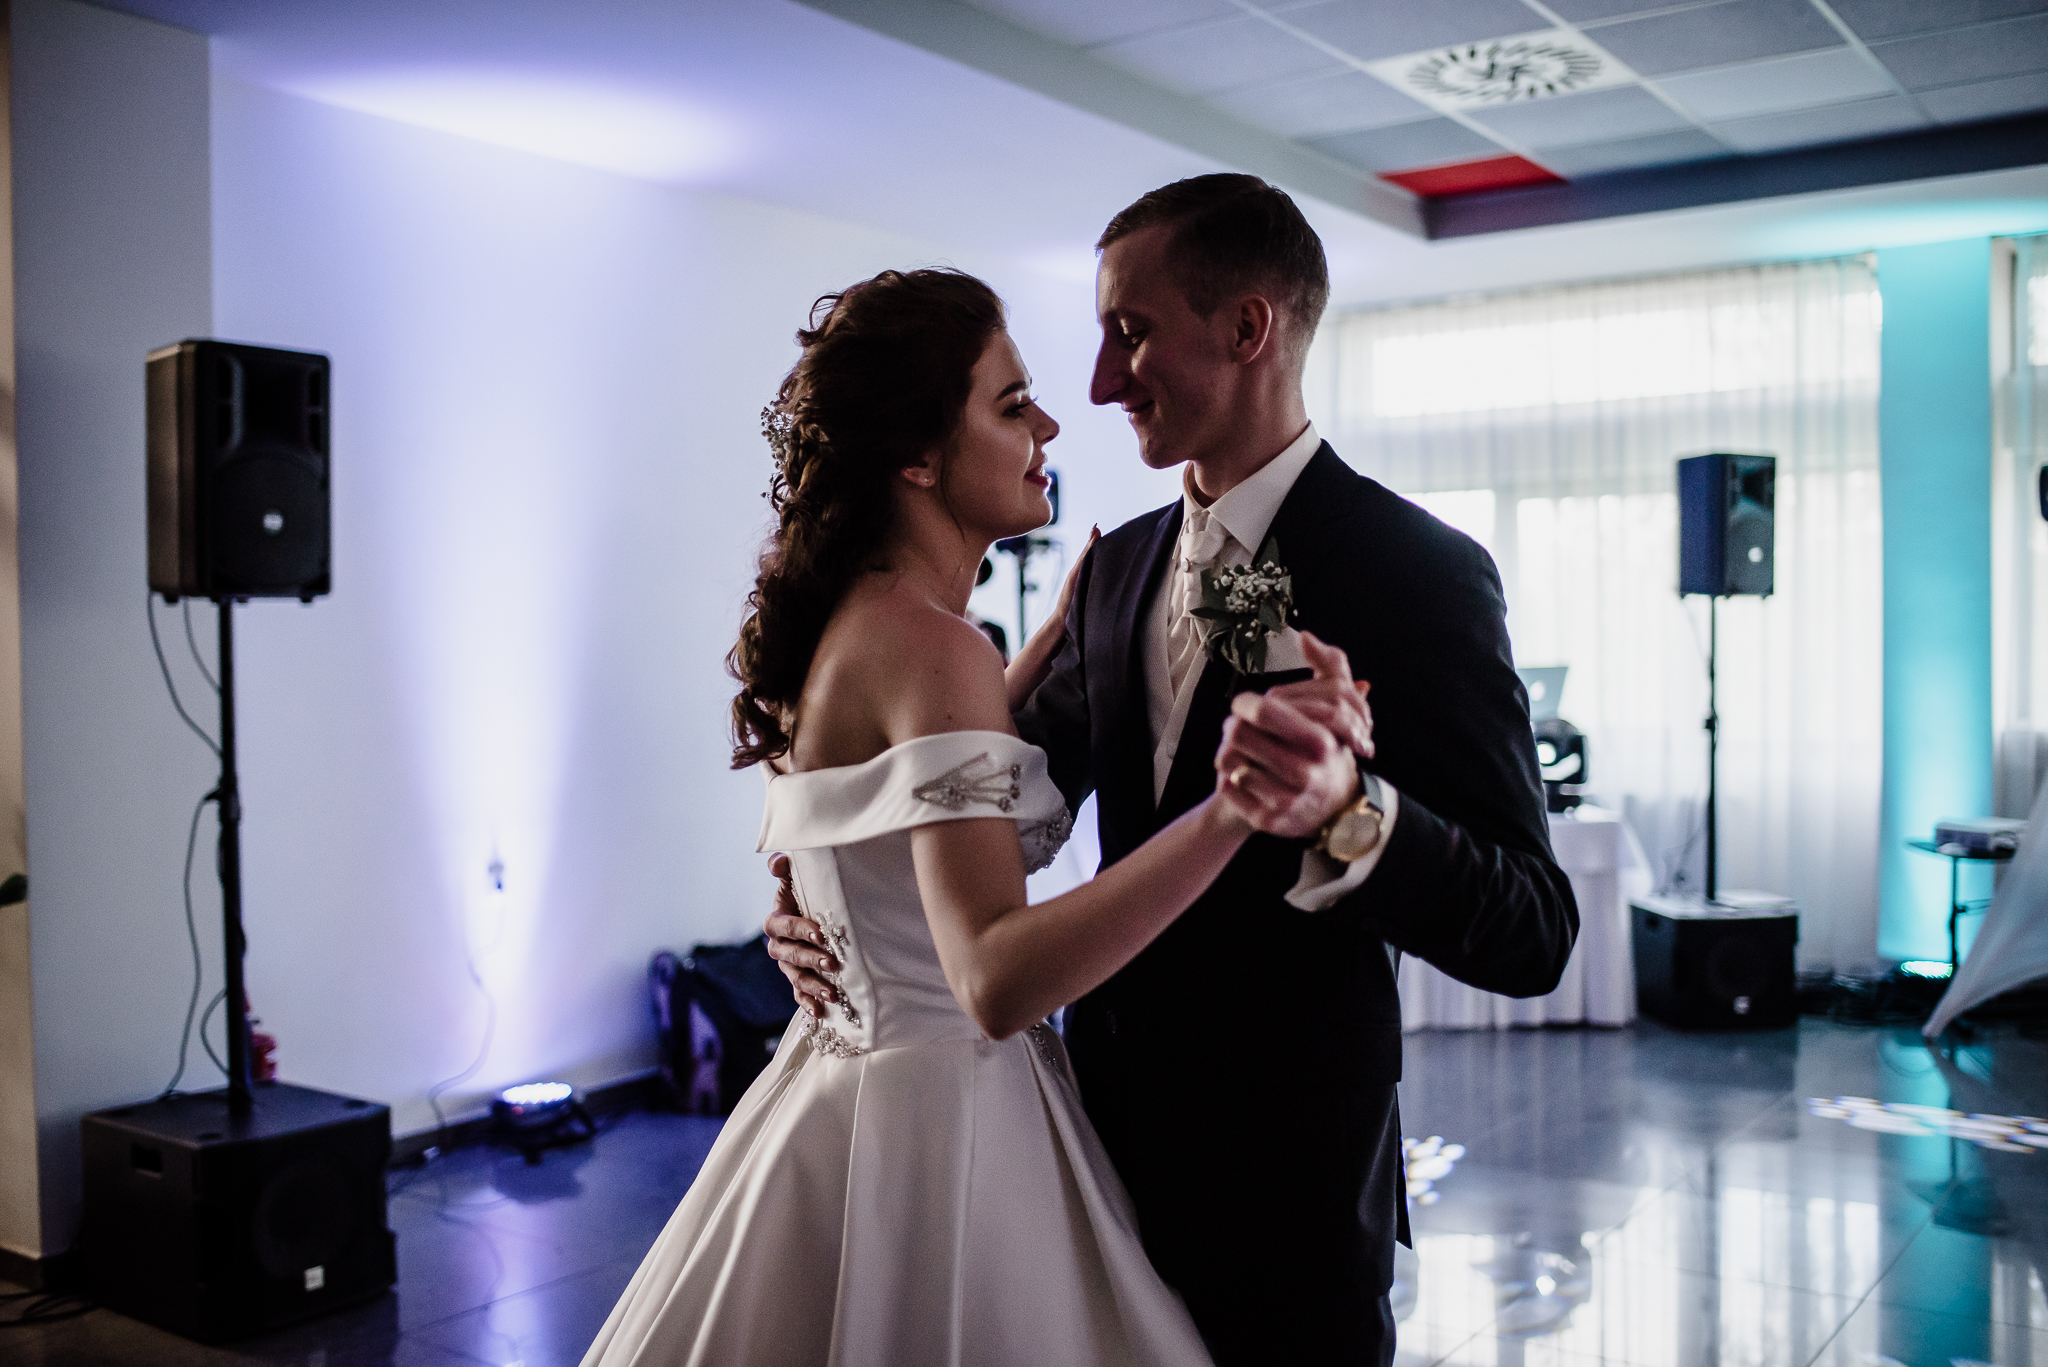 Svadba Pata, Kulturák u Palušáka 01 #svadobnyDJ, #djanasvadbu, #svadba, #svadbapata, #Pata #DJAnavi